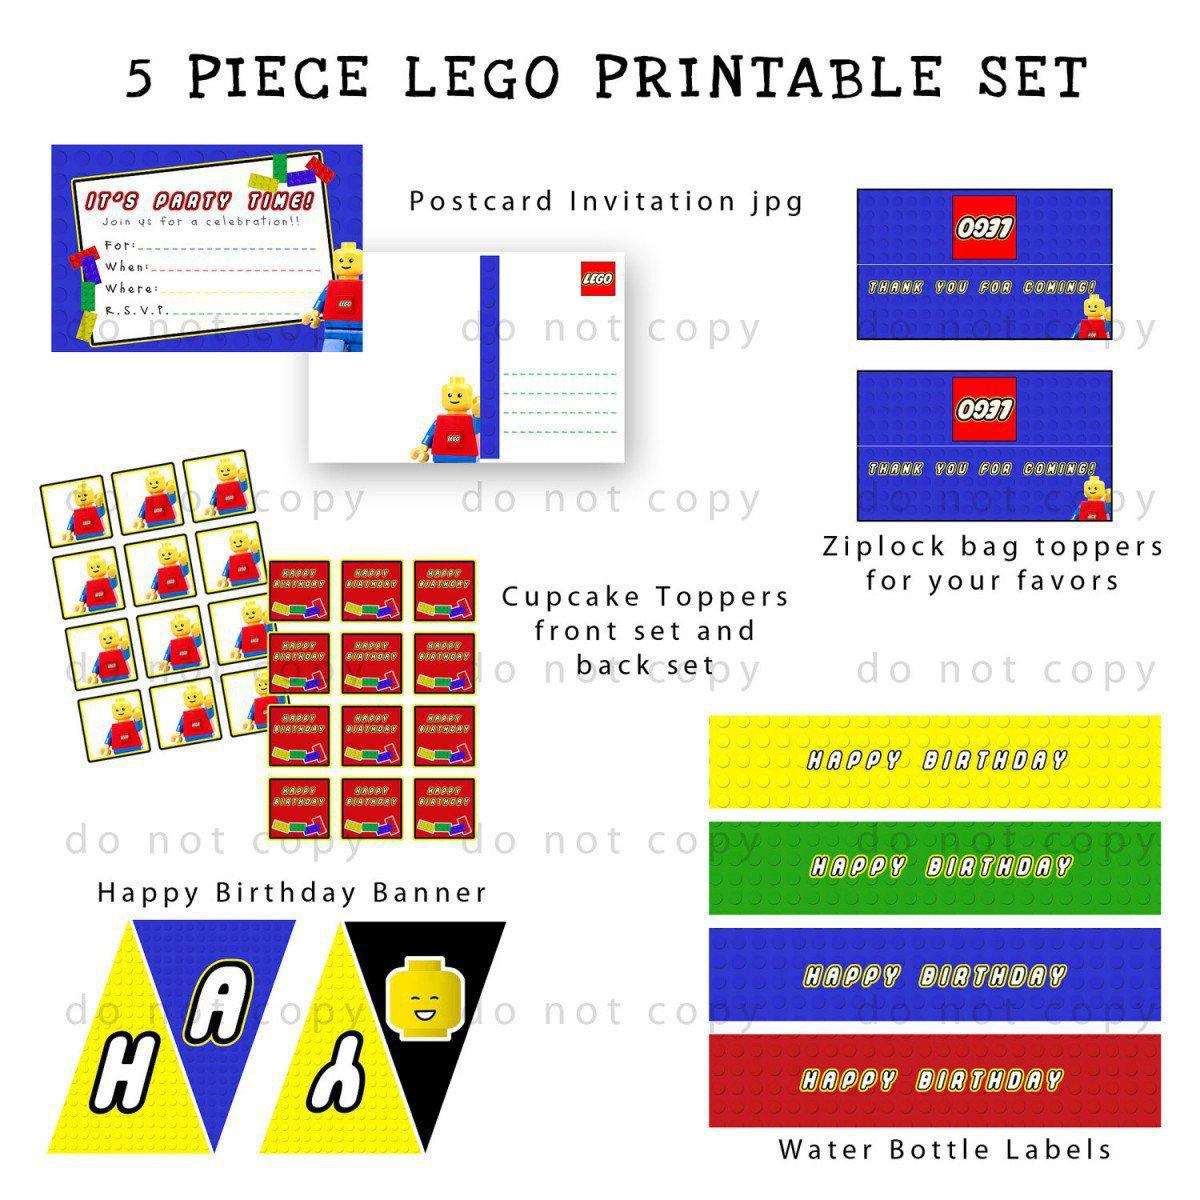 Free Printable Lego Star Wars Invitations